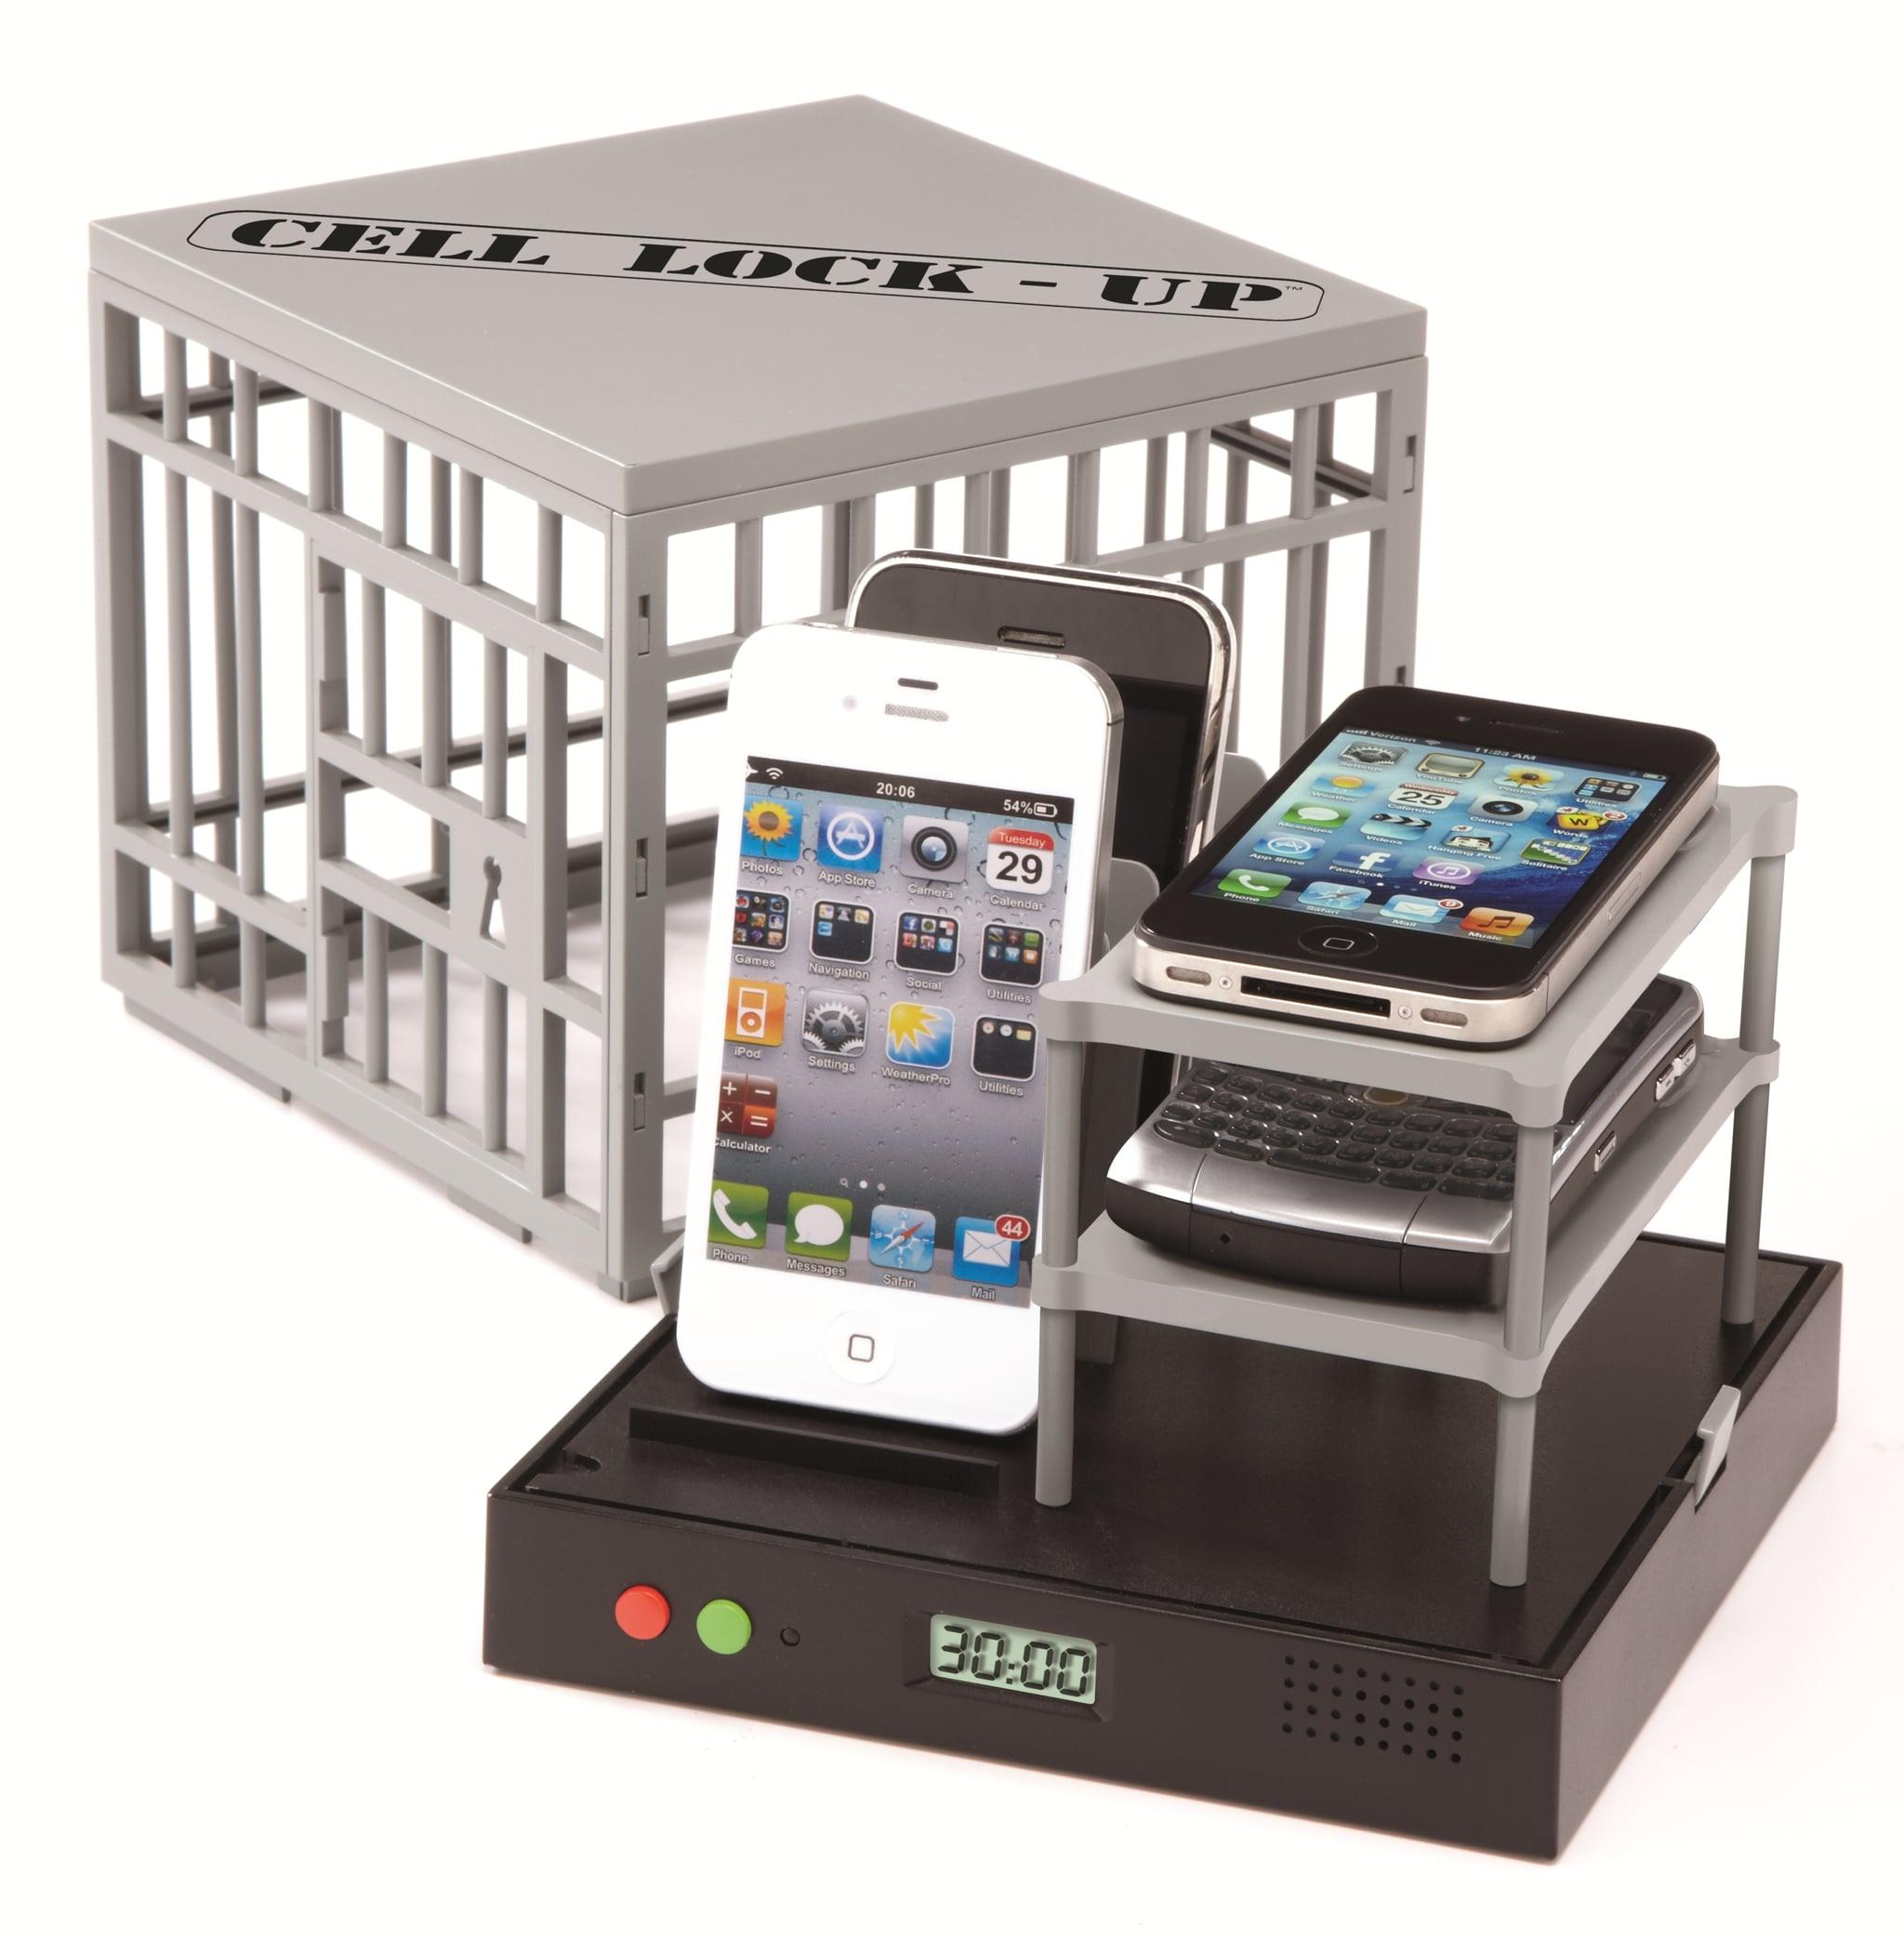 Cell Phone Prison Locker With Timer | POPSUGAR Family